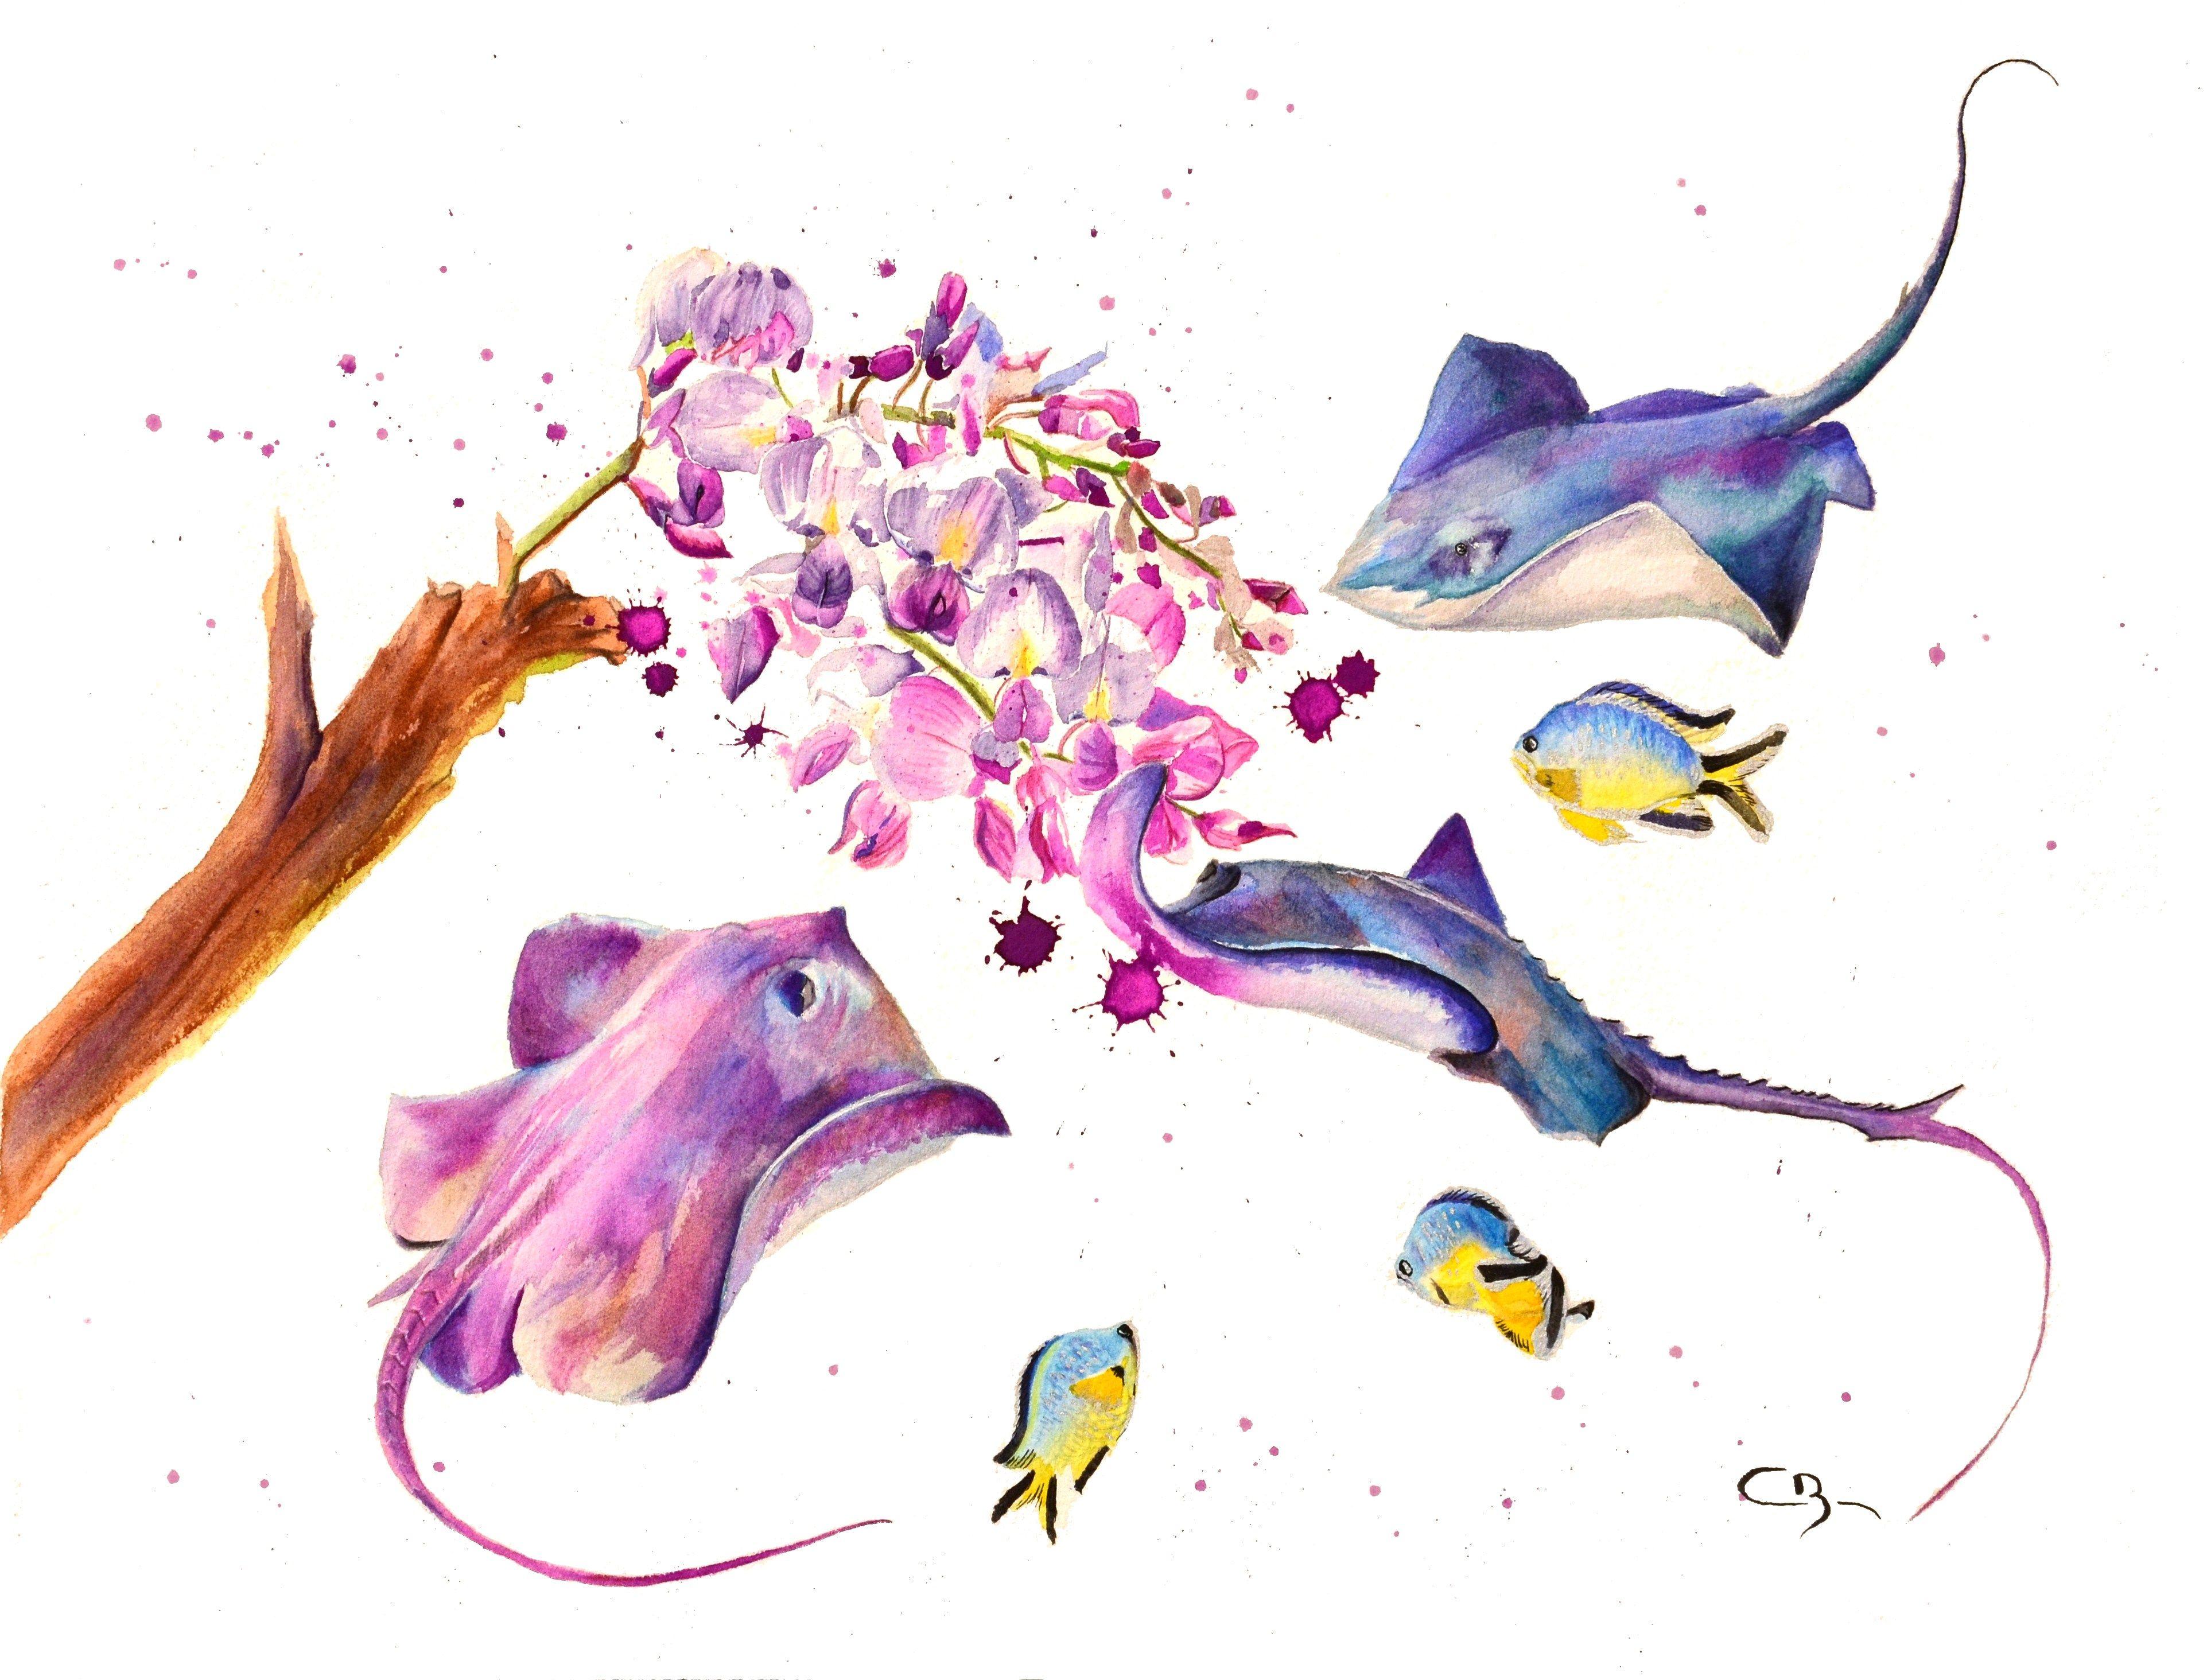 Aquarelle I Love Art Demo Art Amour Dessin Aquarelle Et